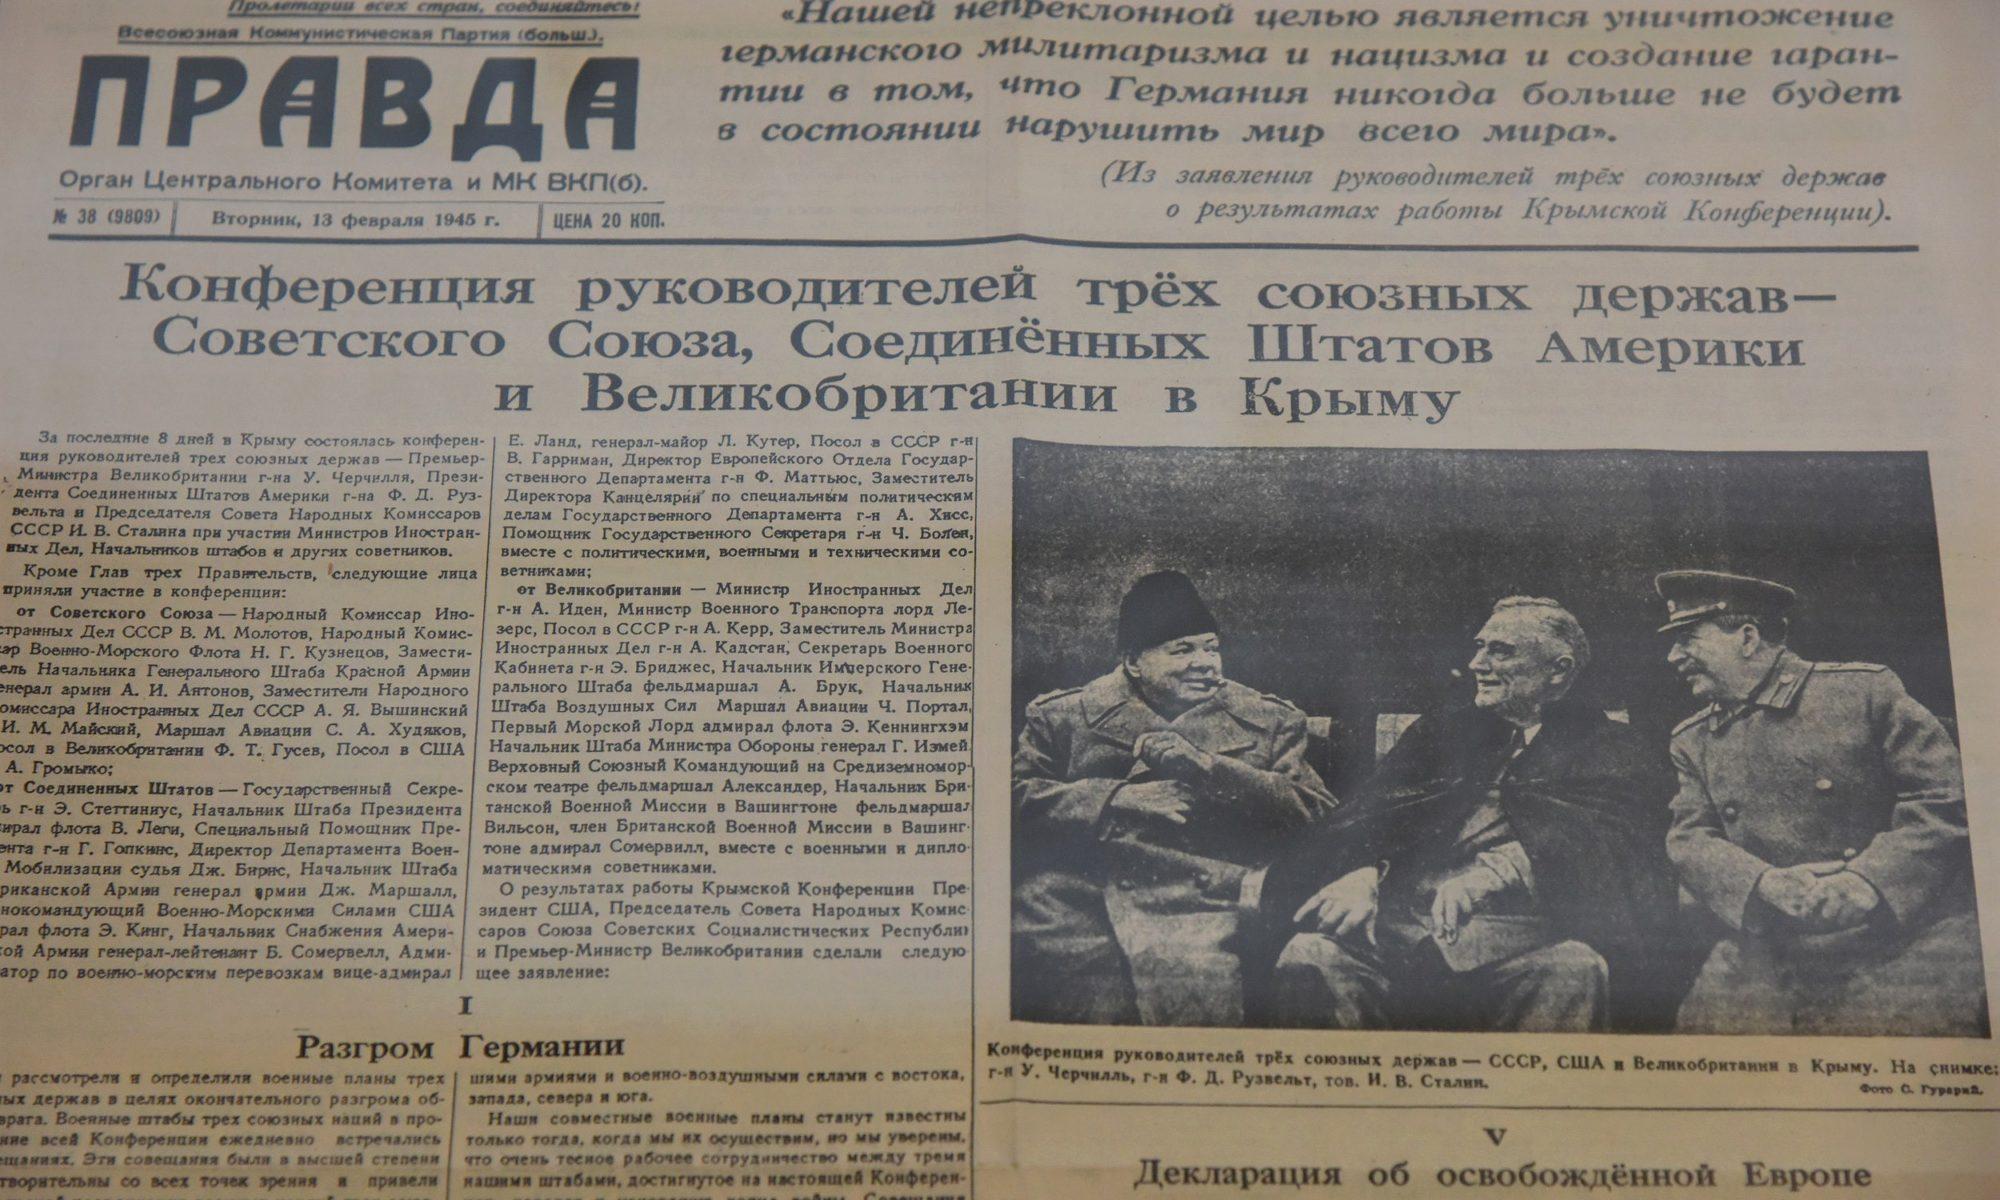 Газета «Правда» № 38, 13 февраля 1945 г.